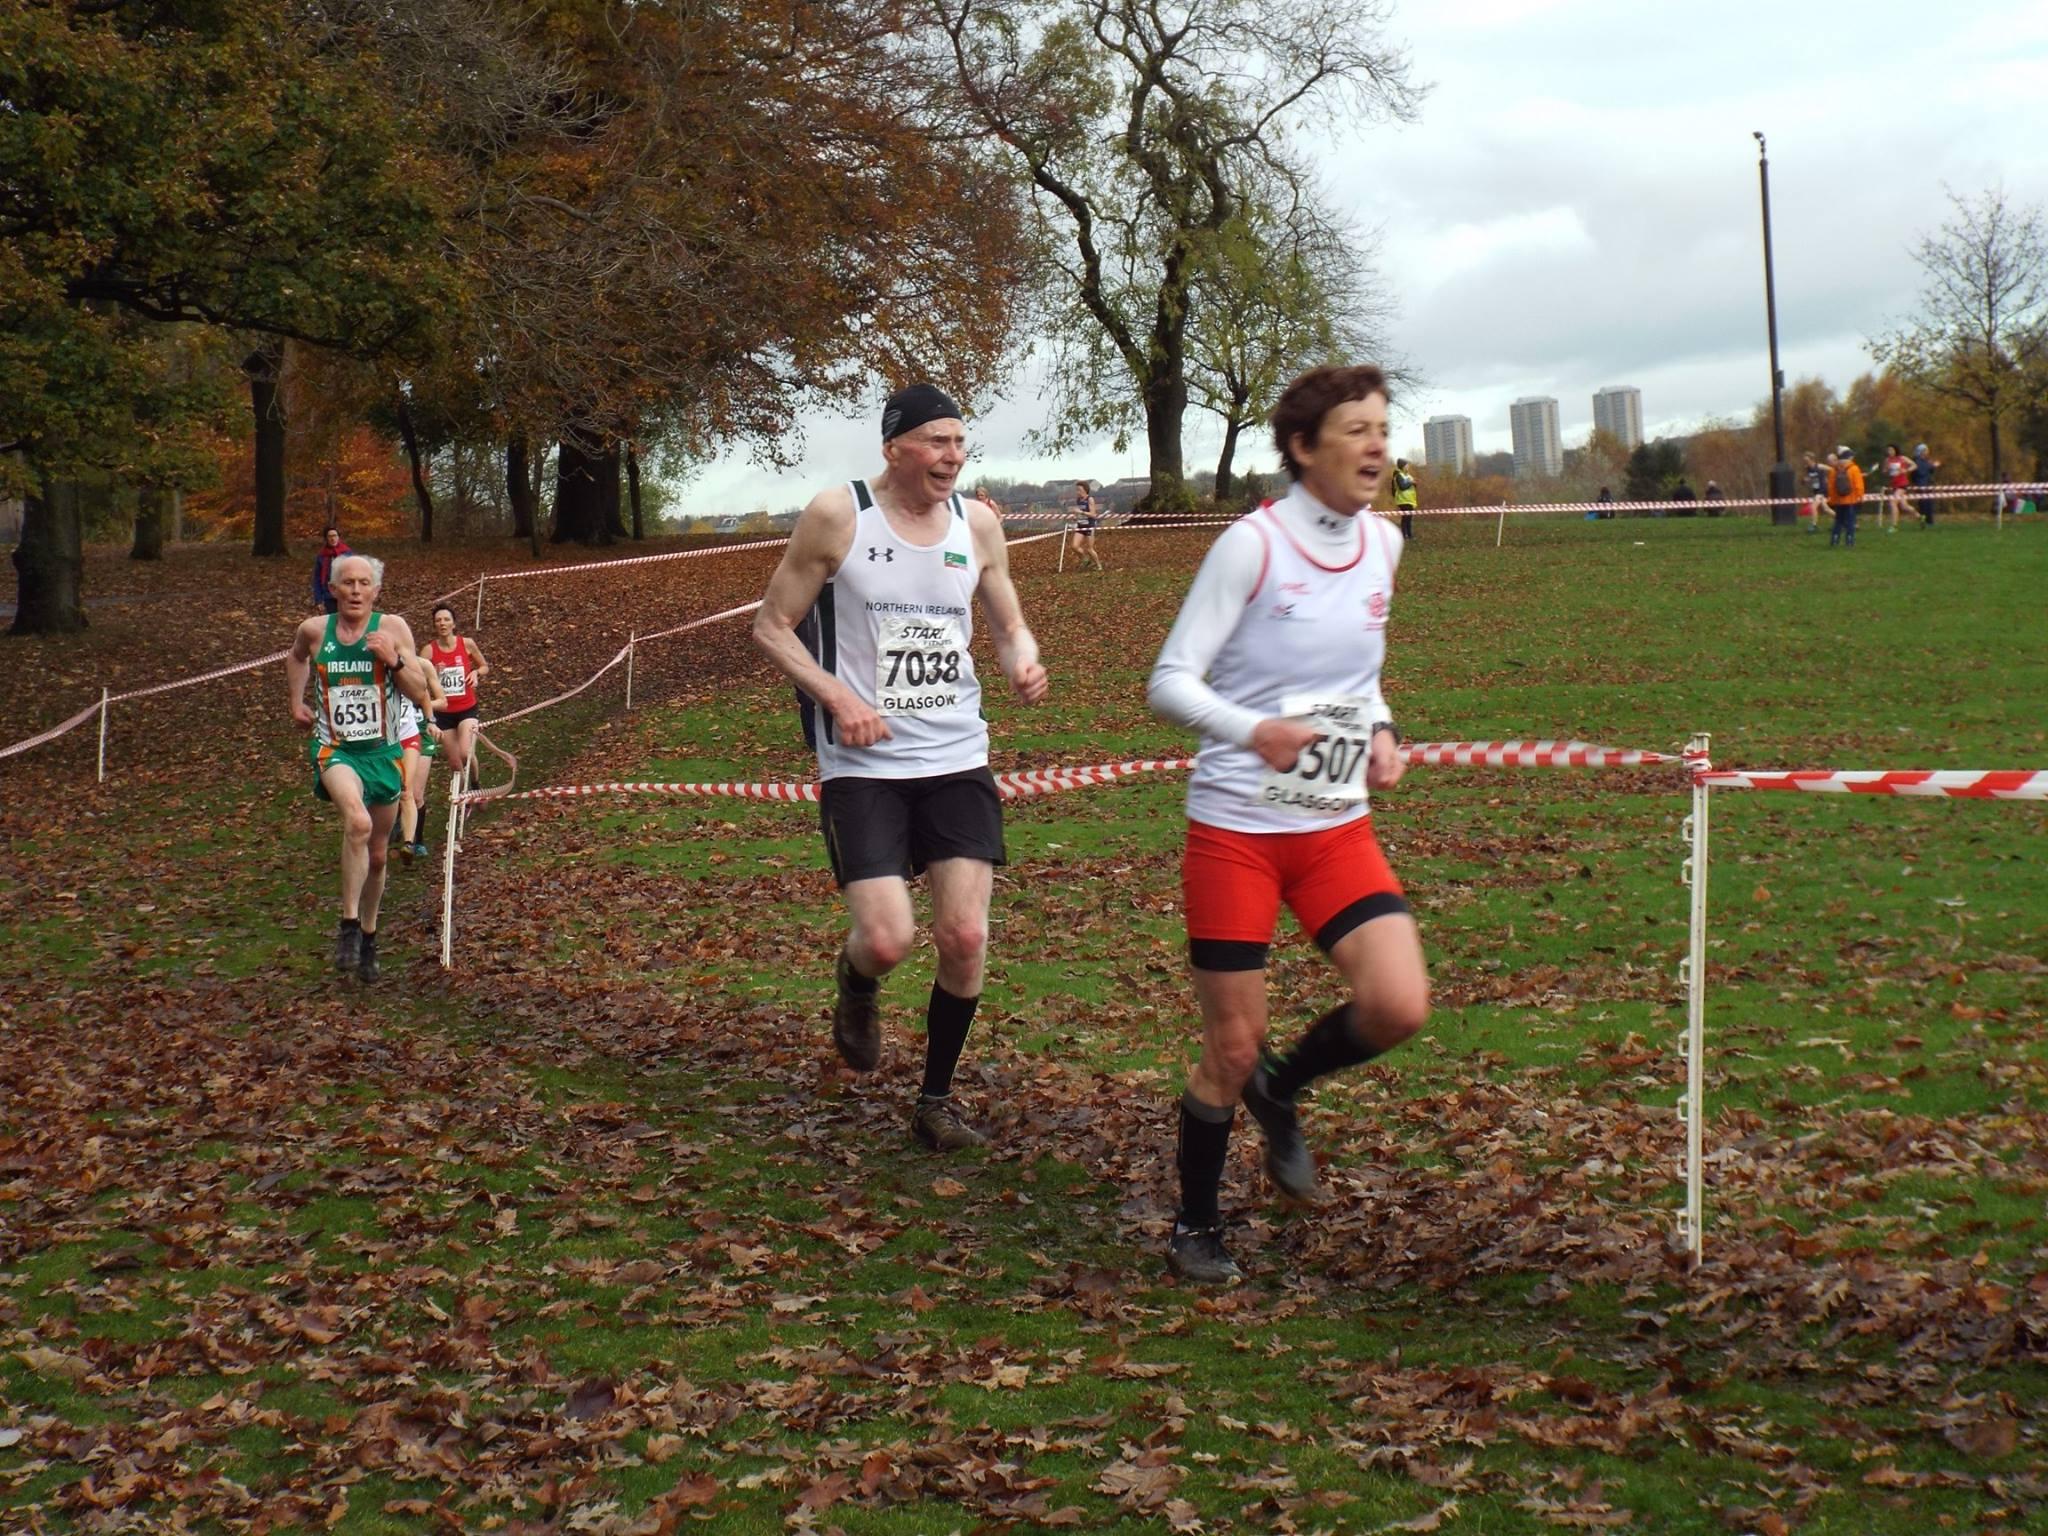 Town Moor Memorial 10k And Junior Races/Mojacar Half Marathon/Druridge Bay Parkrun/Workington